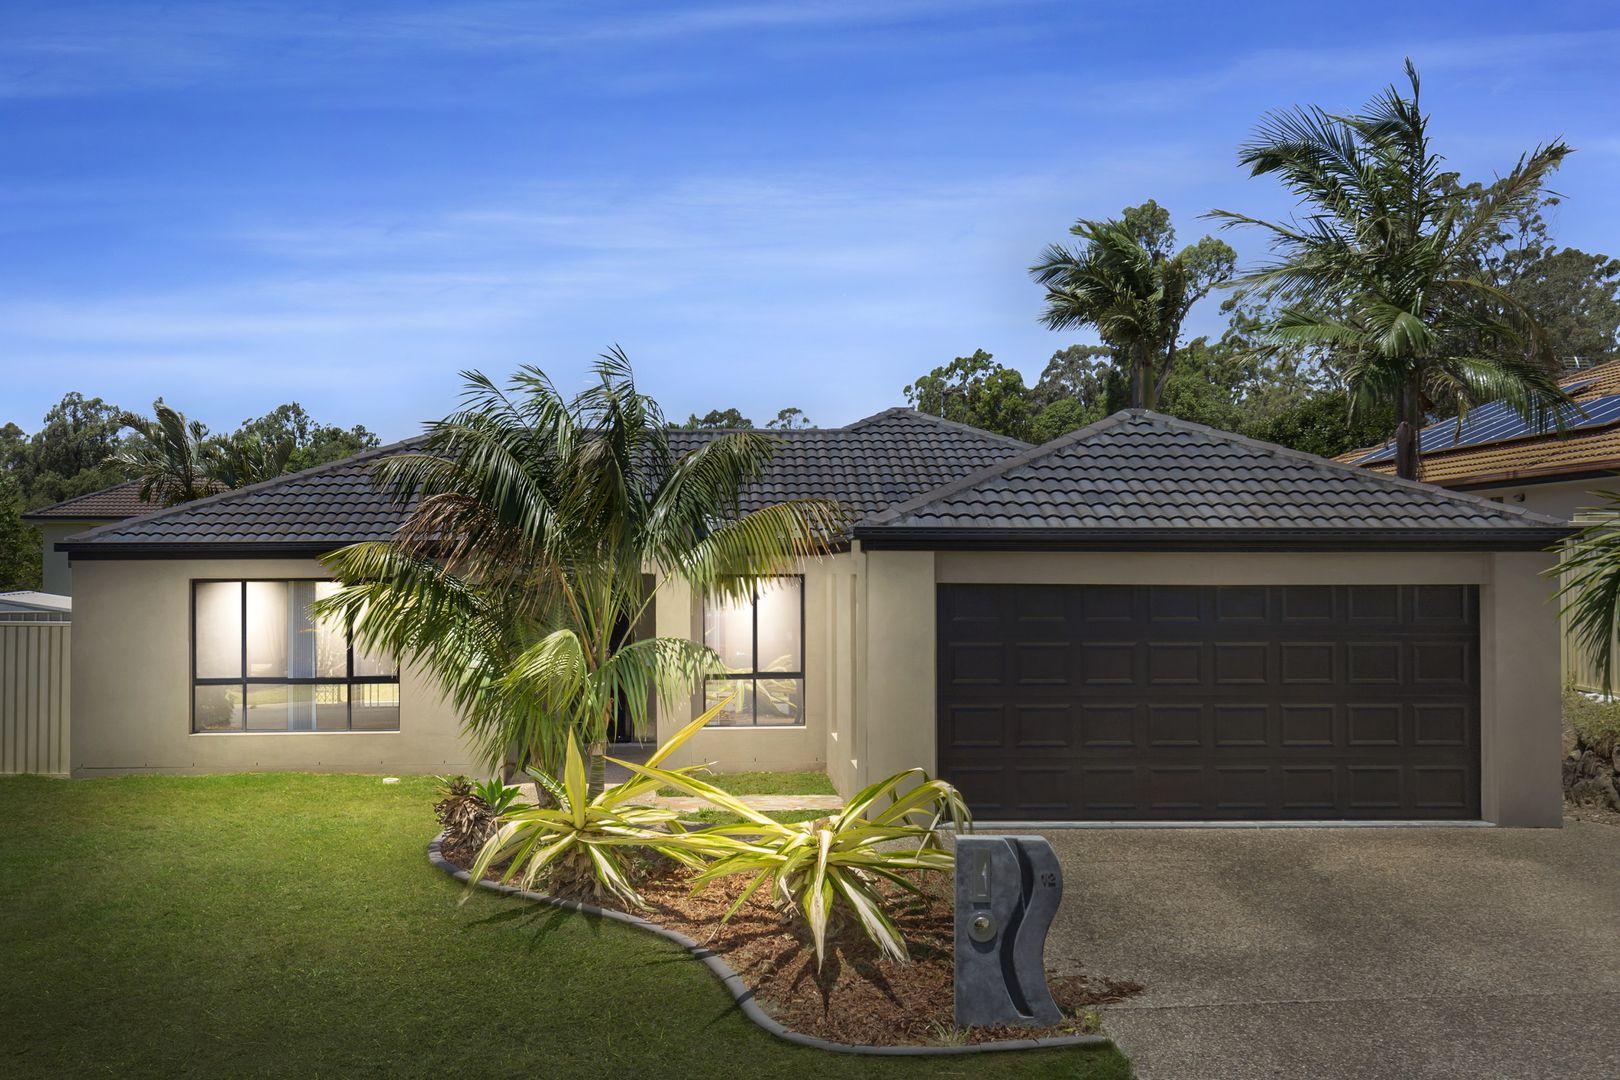 12 Rumbold Court, Upper Coomera QLD 4209, Image 0